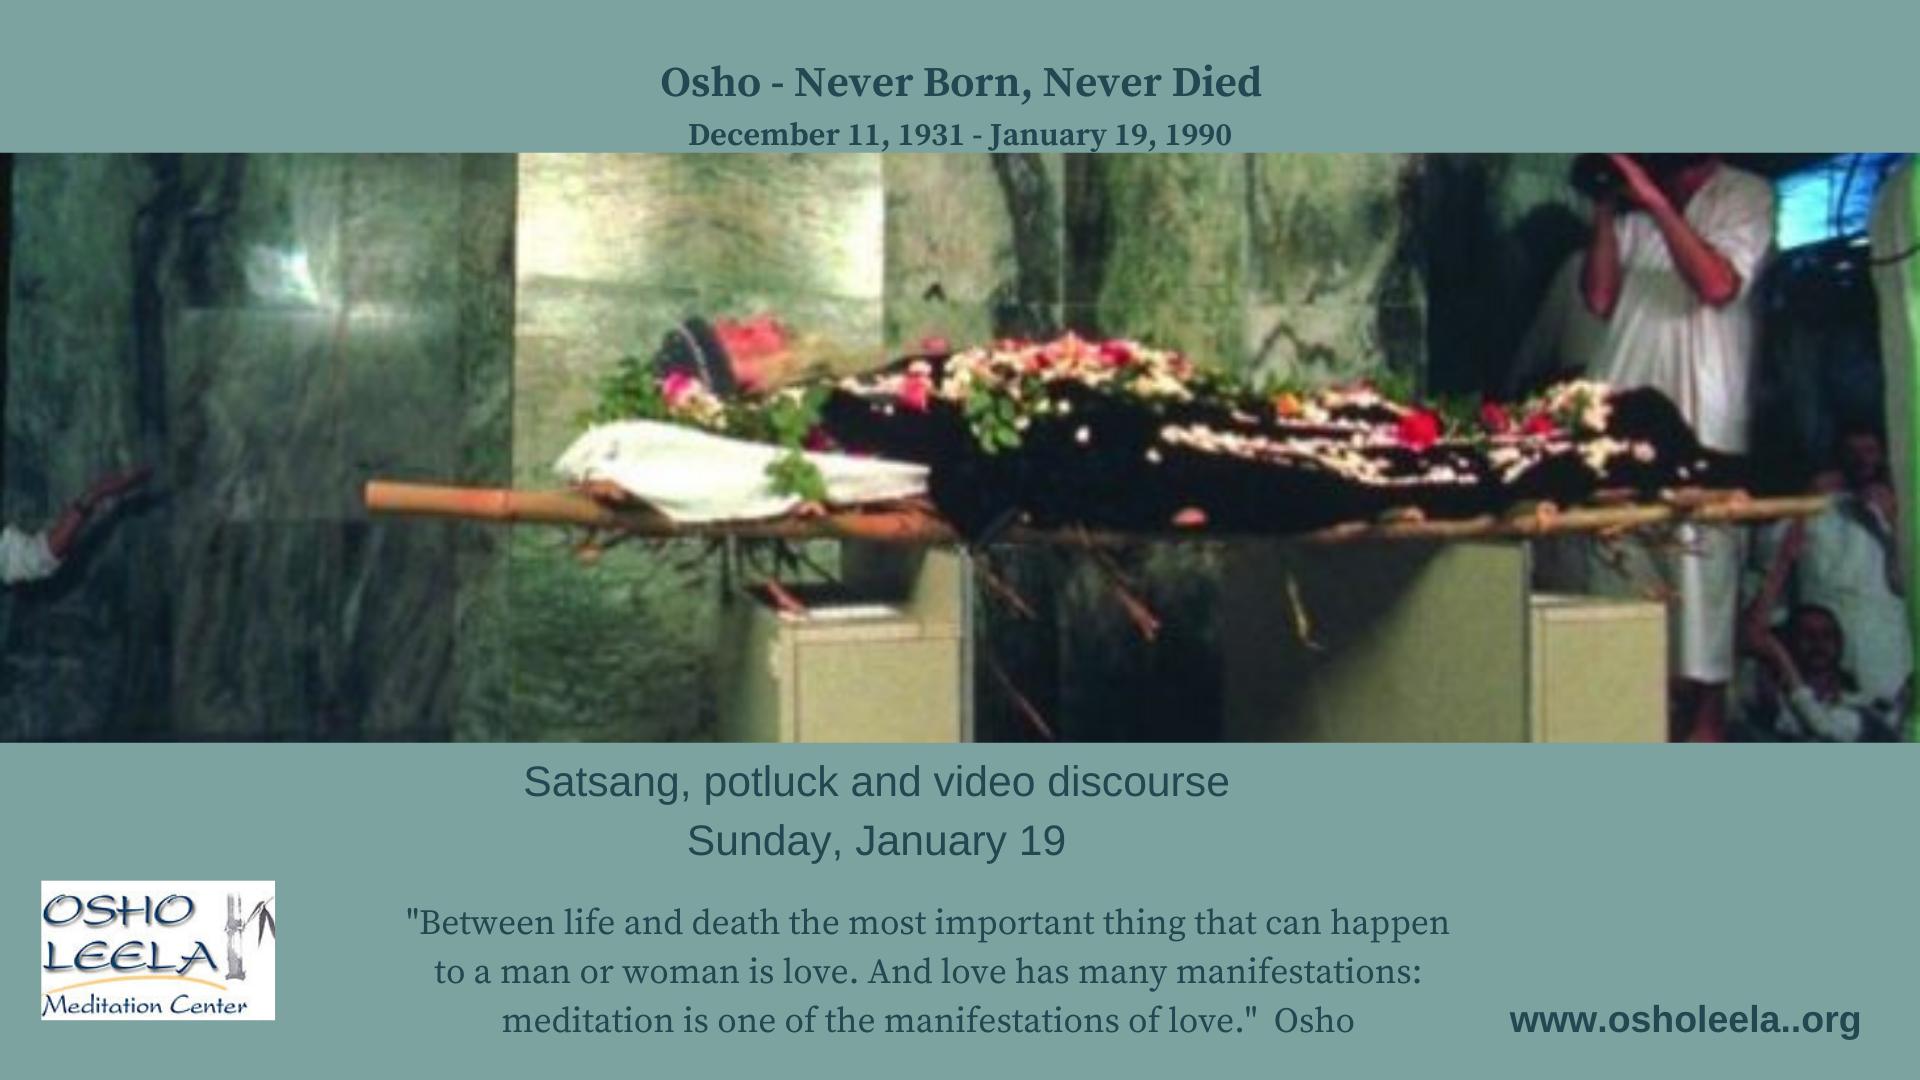 Osho: Never Born, Never Died Celebration